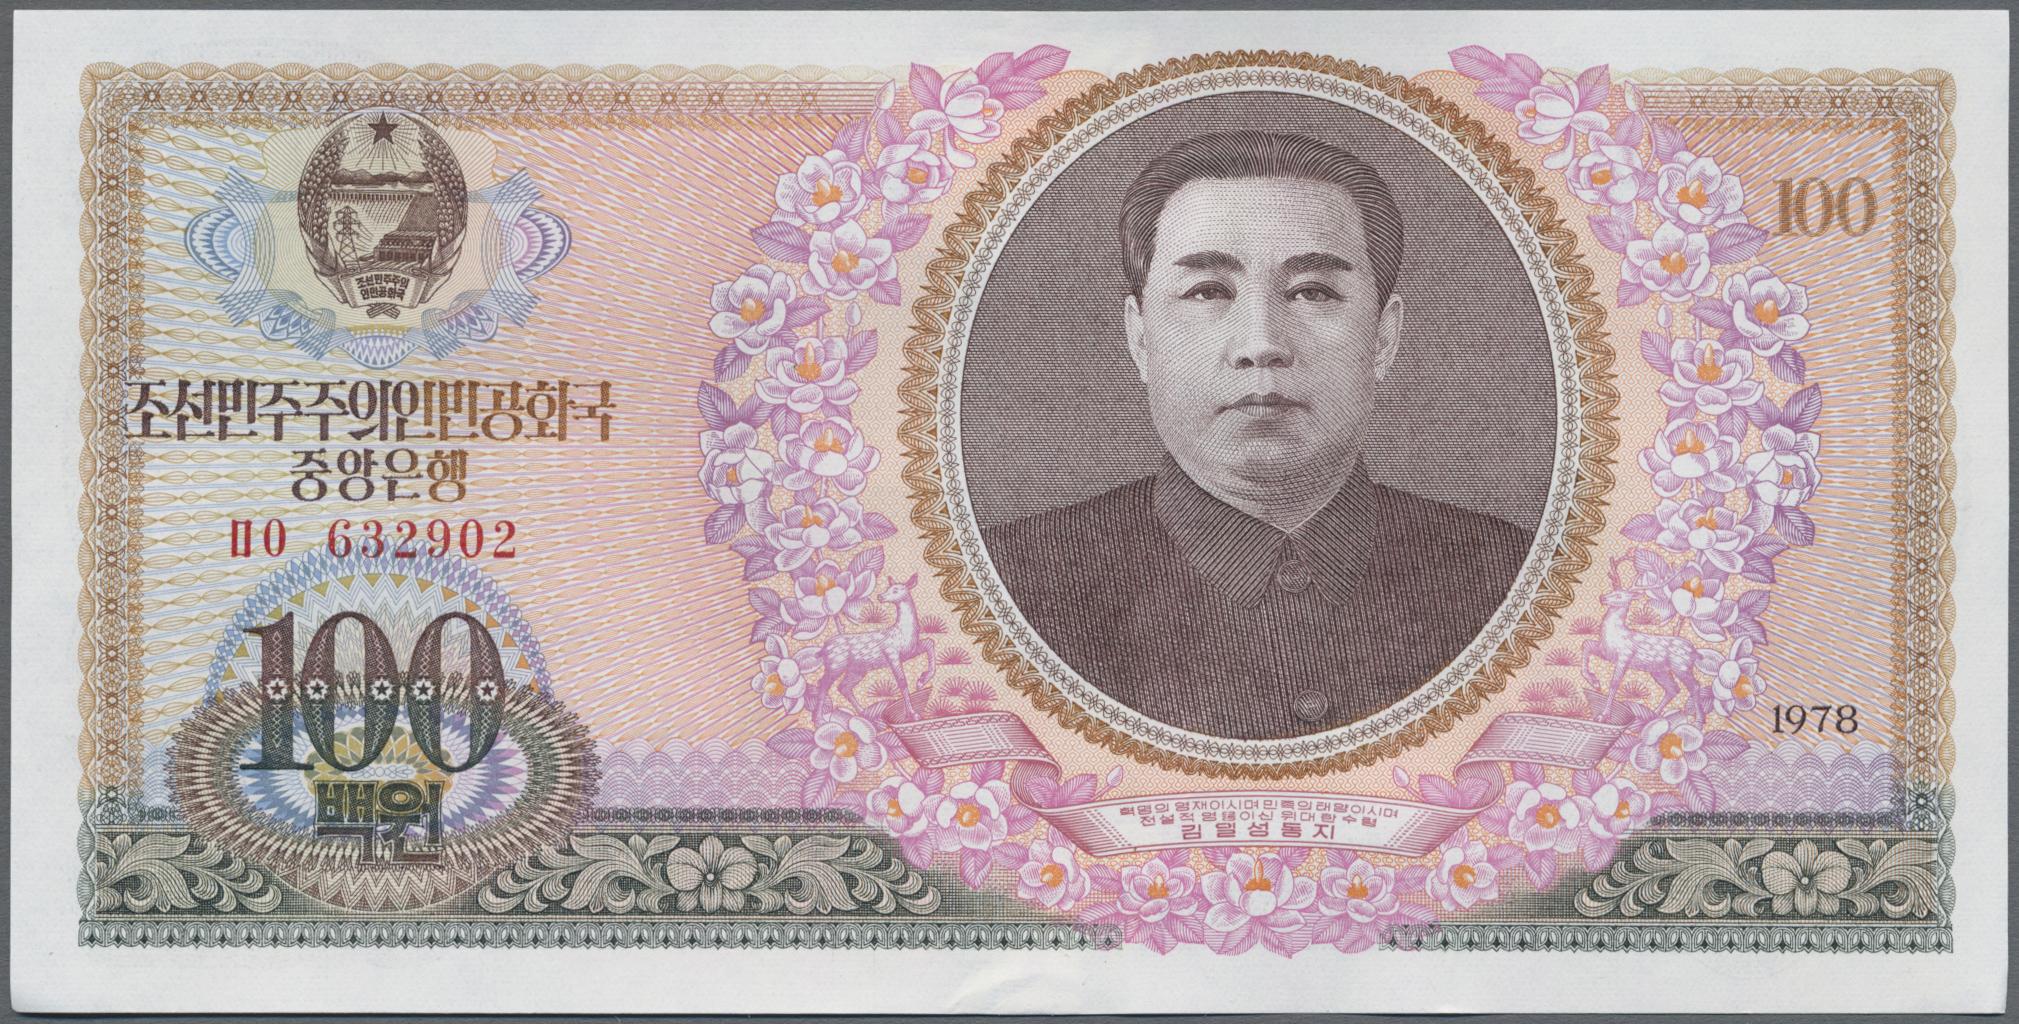 Lot 00393 - North Korea / Banknoten  -  Auktionshaus Christoph Gärtner GmbH & Co. KG 51th Auction - Day 1